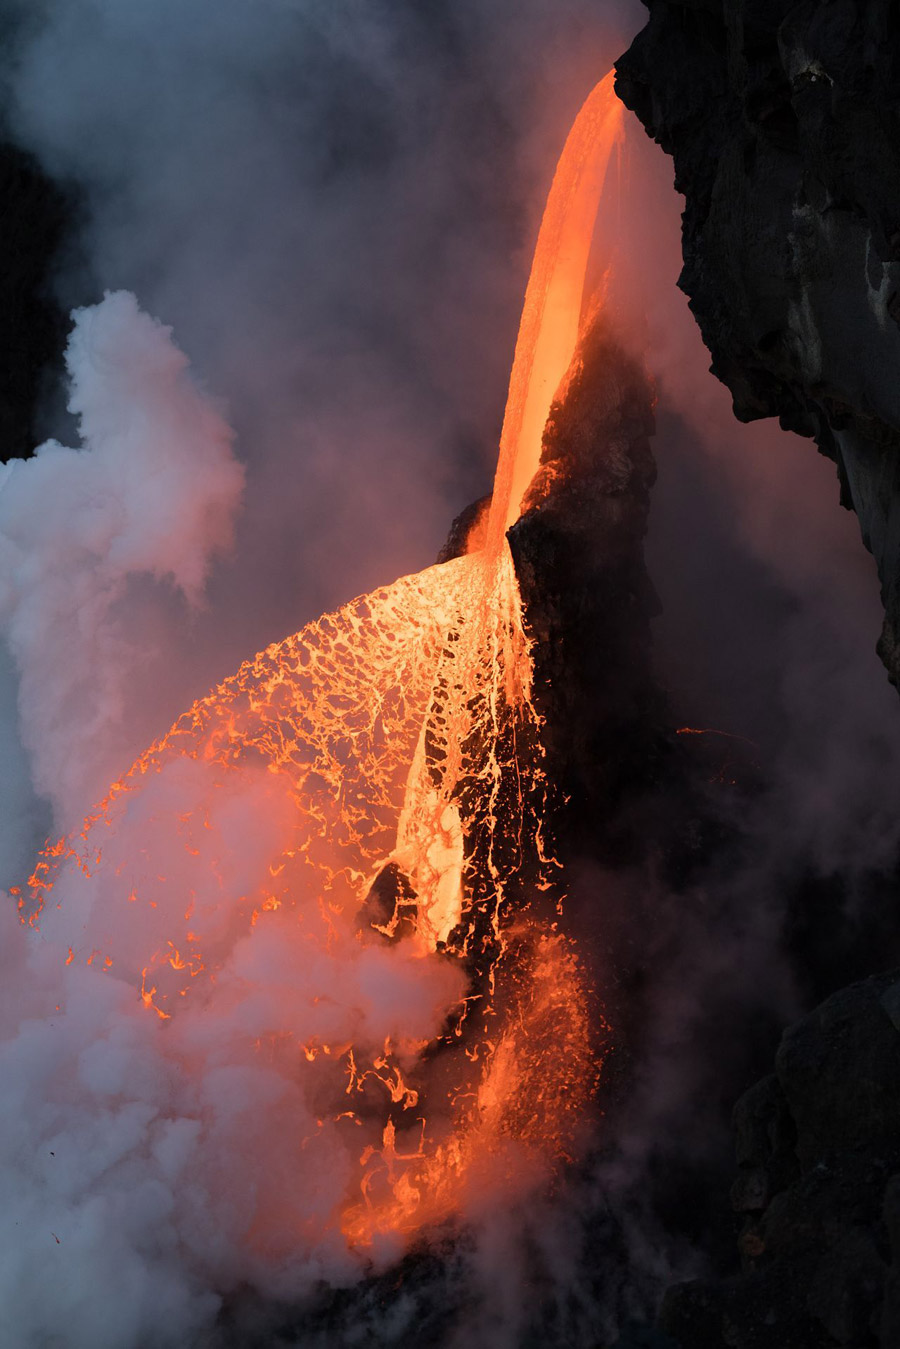 Огненный водопад, © Карим Илия / Karim Iliya, 1 место в категории «Пейзажи», Фотоконкурс Nature Photographer of the Year Contest